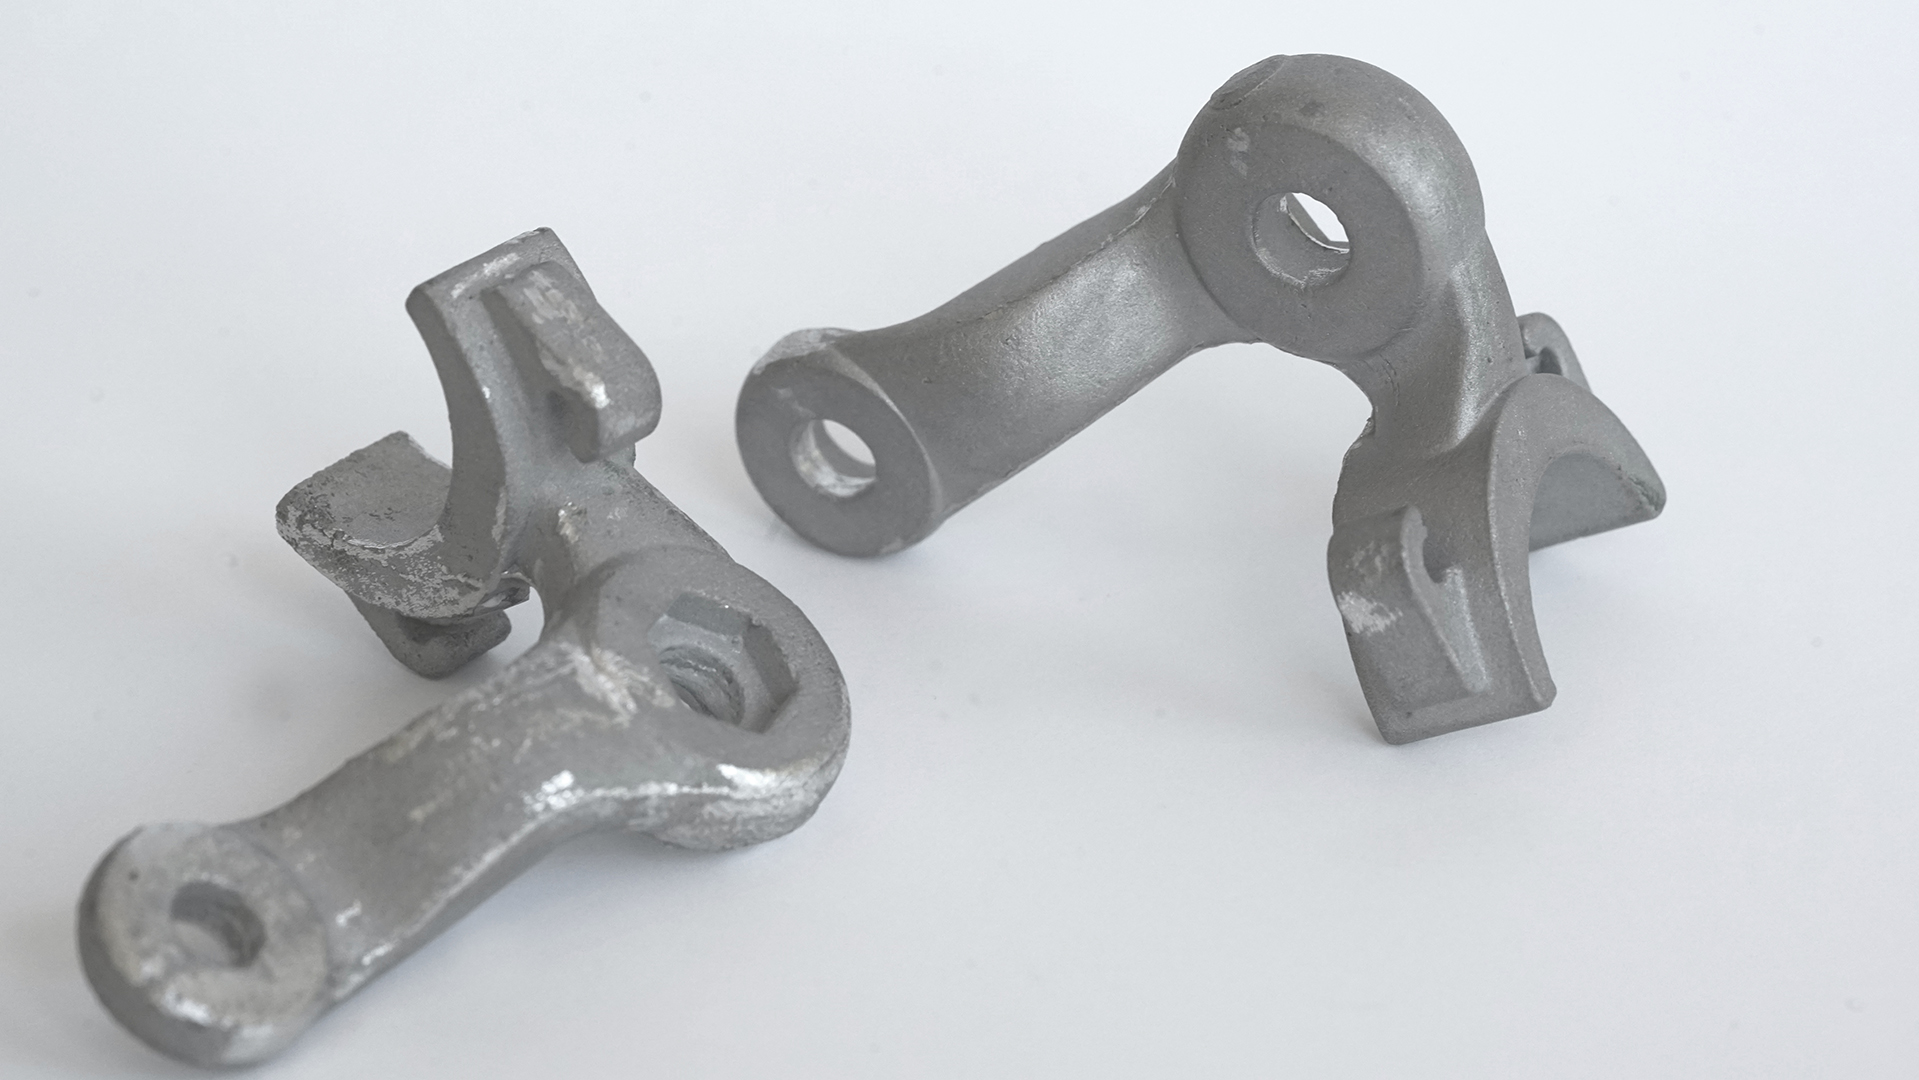 Aus Dentalstahl gegossene Bauteile sandgestrahlt